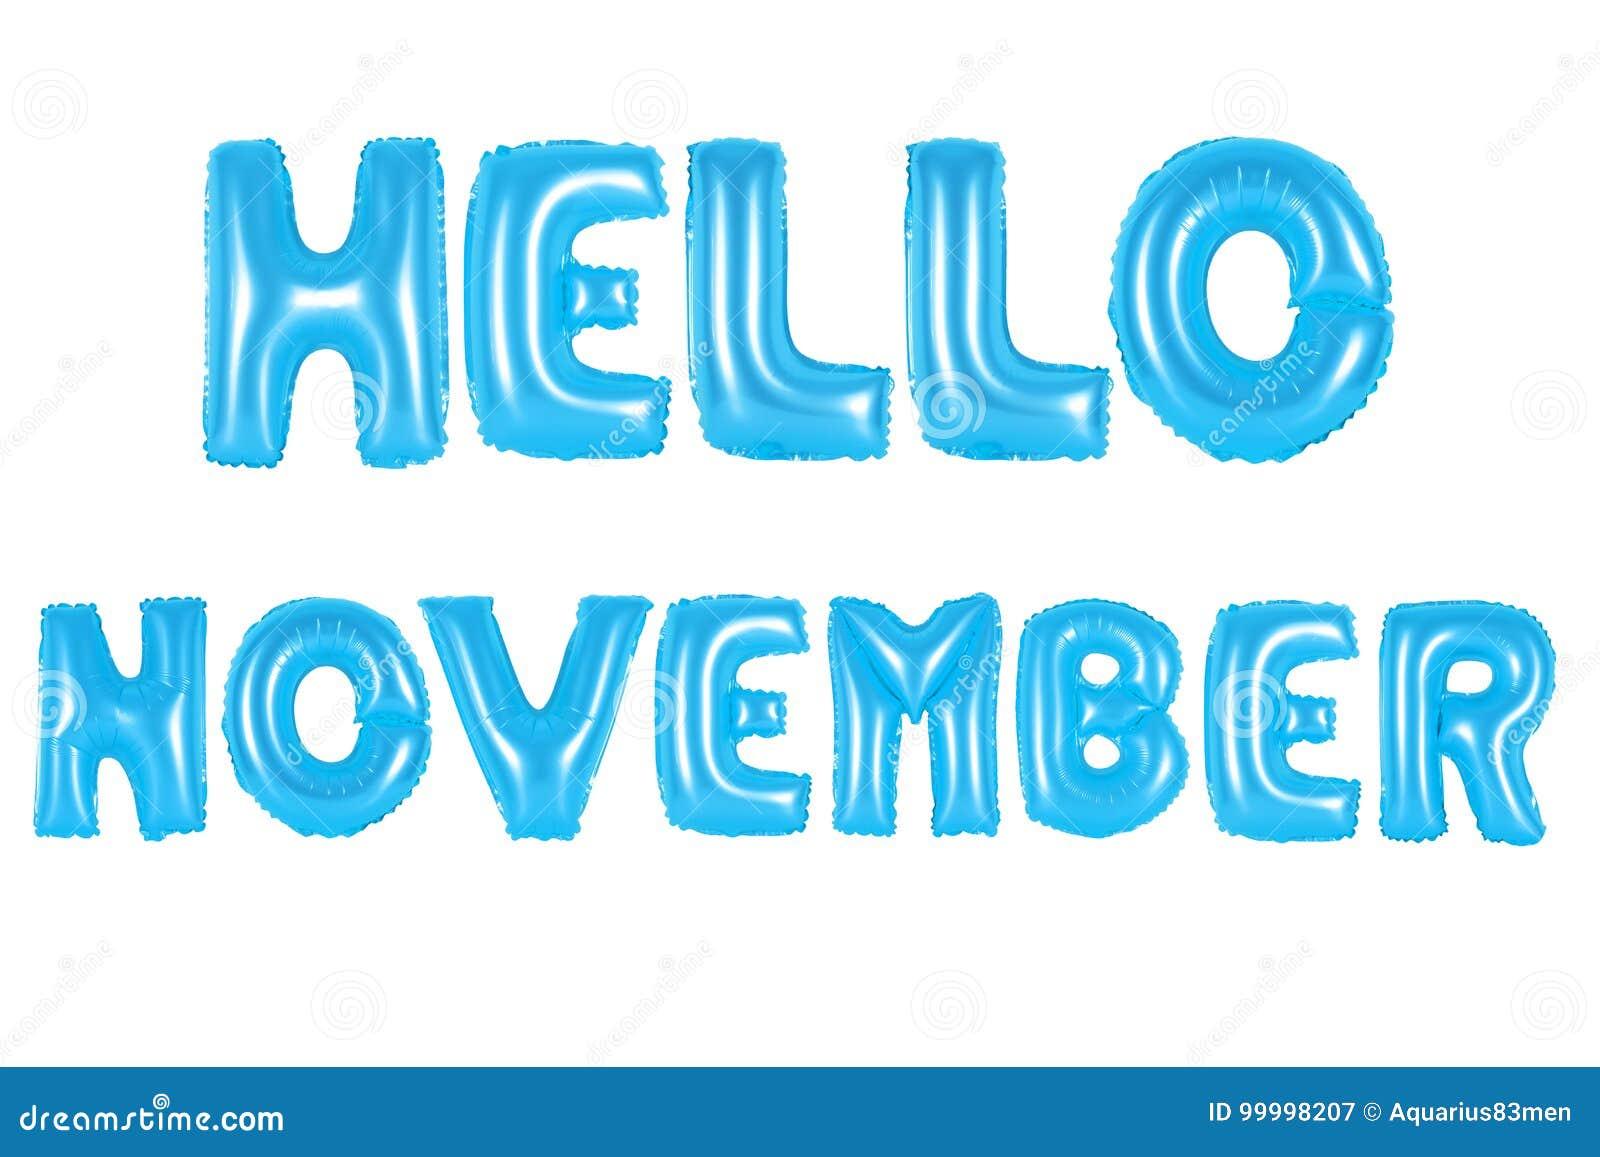 Hello november, blue color stock image. Image of education - 99998207